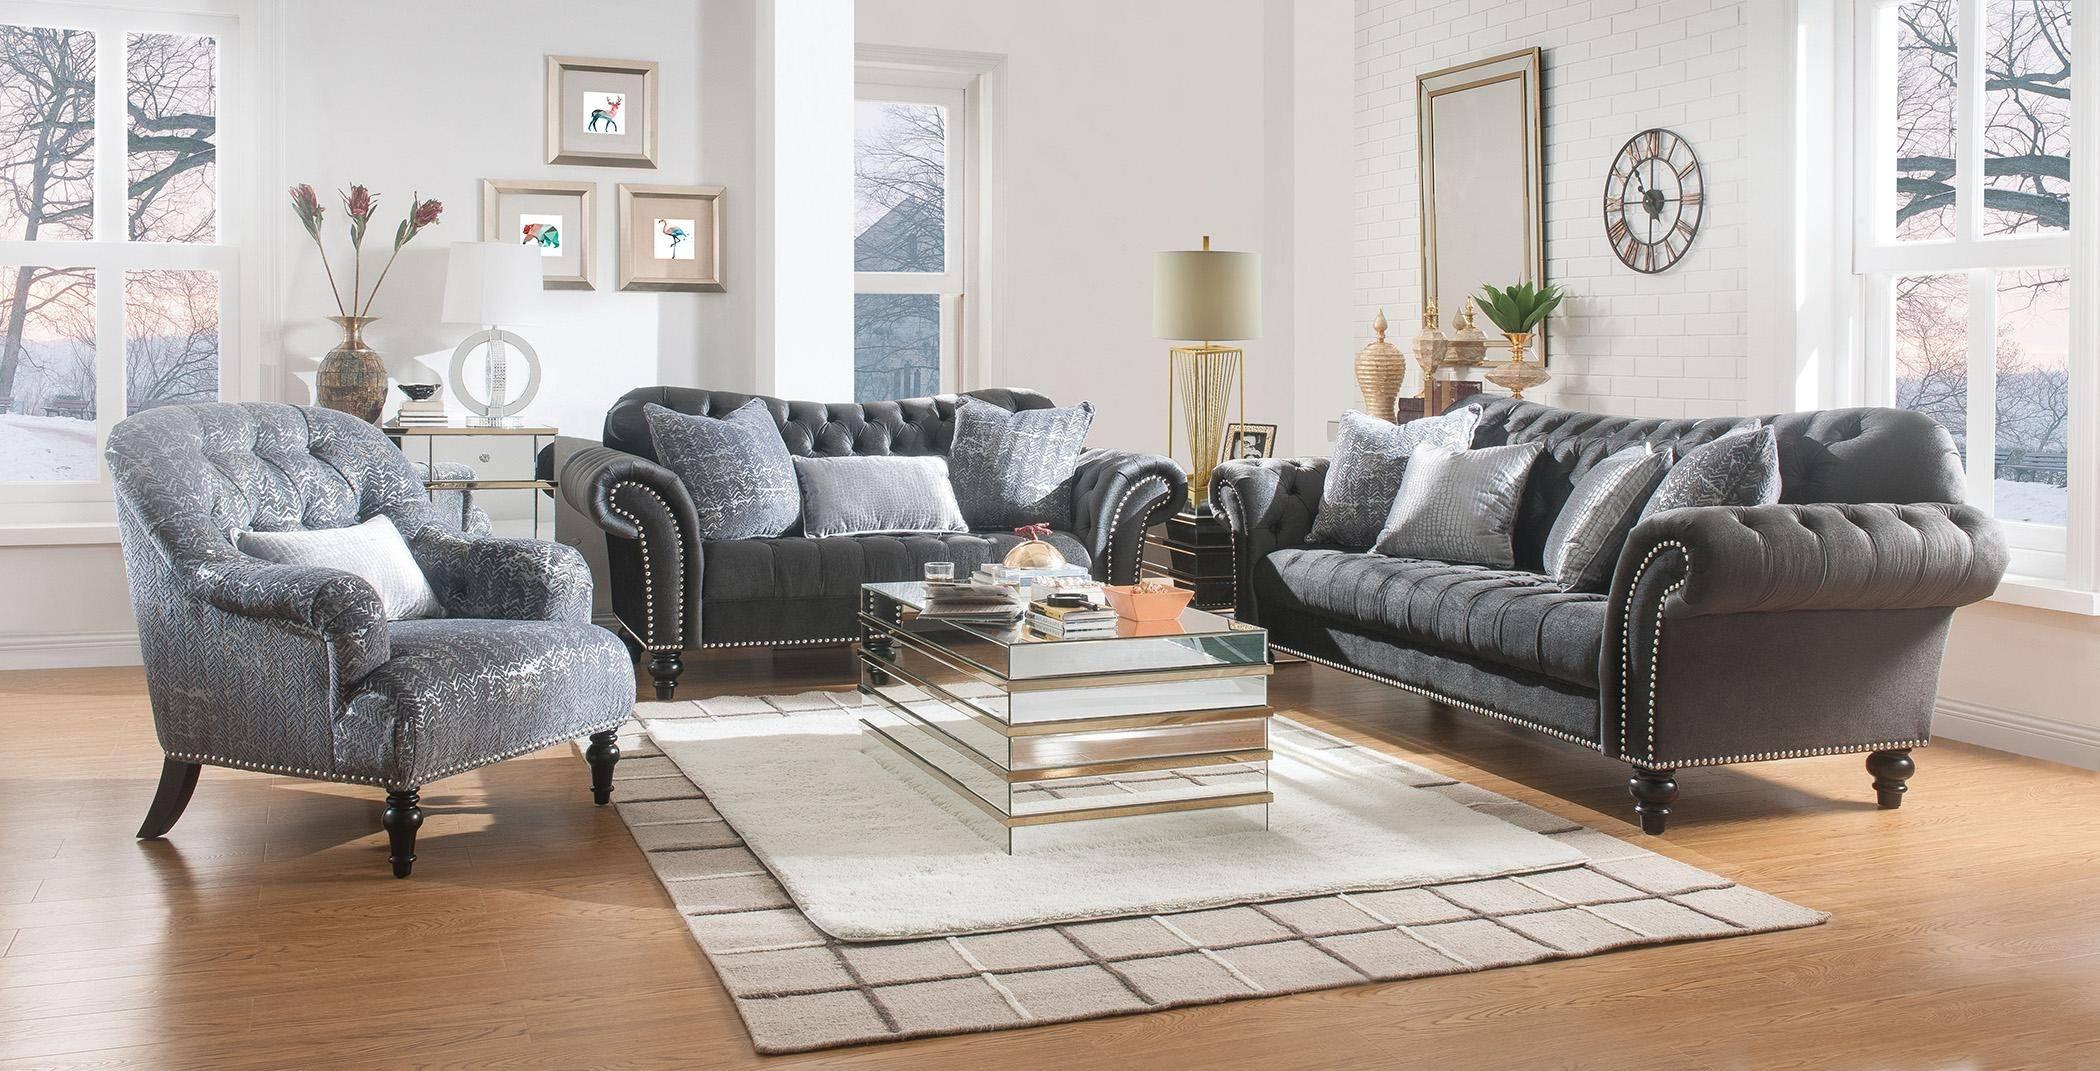 acme gaura sofa in dark gray fabric